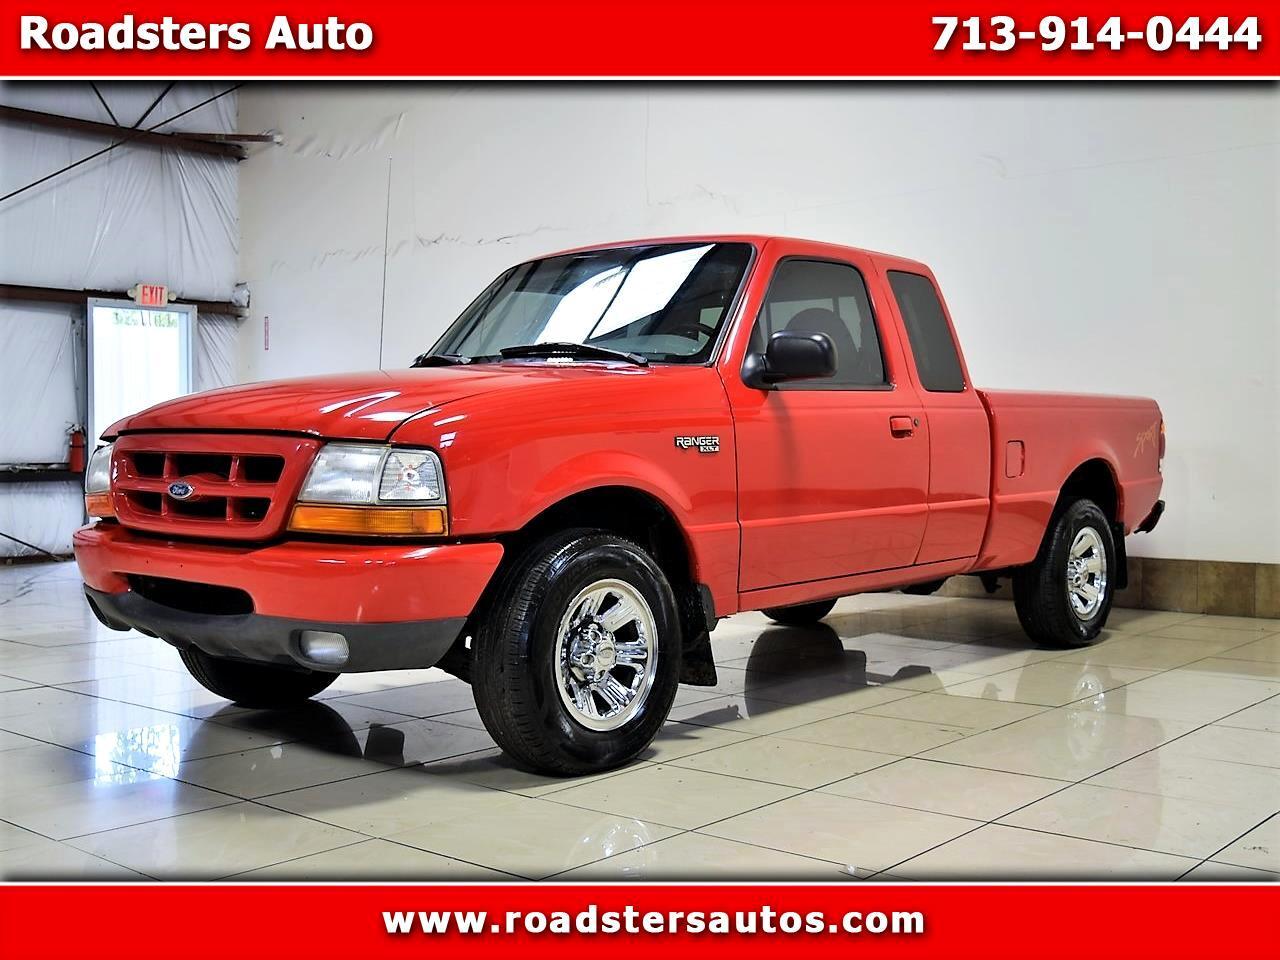 1999 Ford Ranger XLT SuperCab 2WD